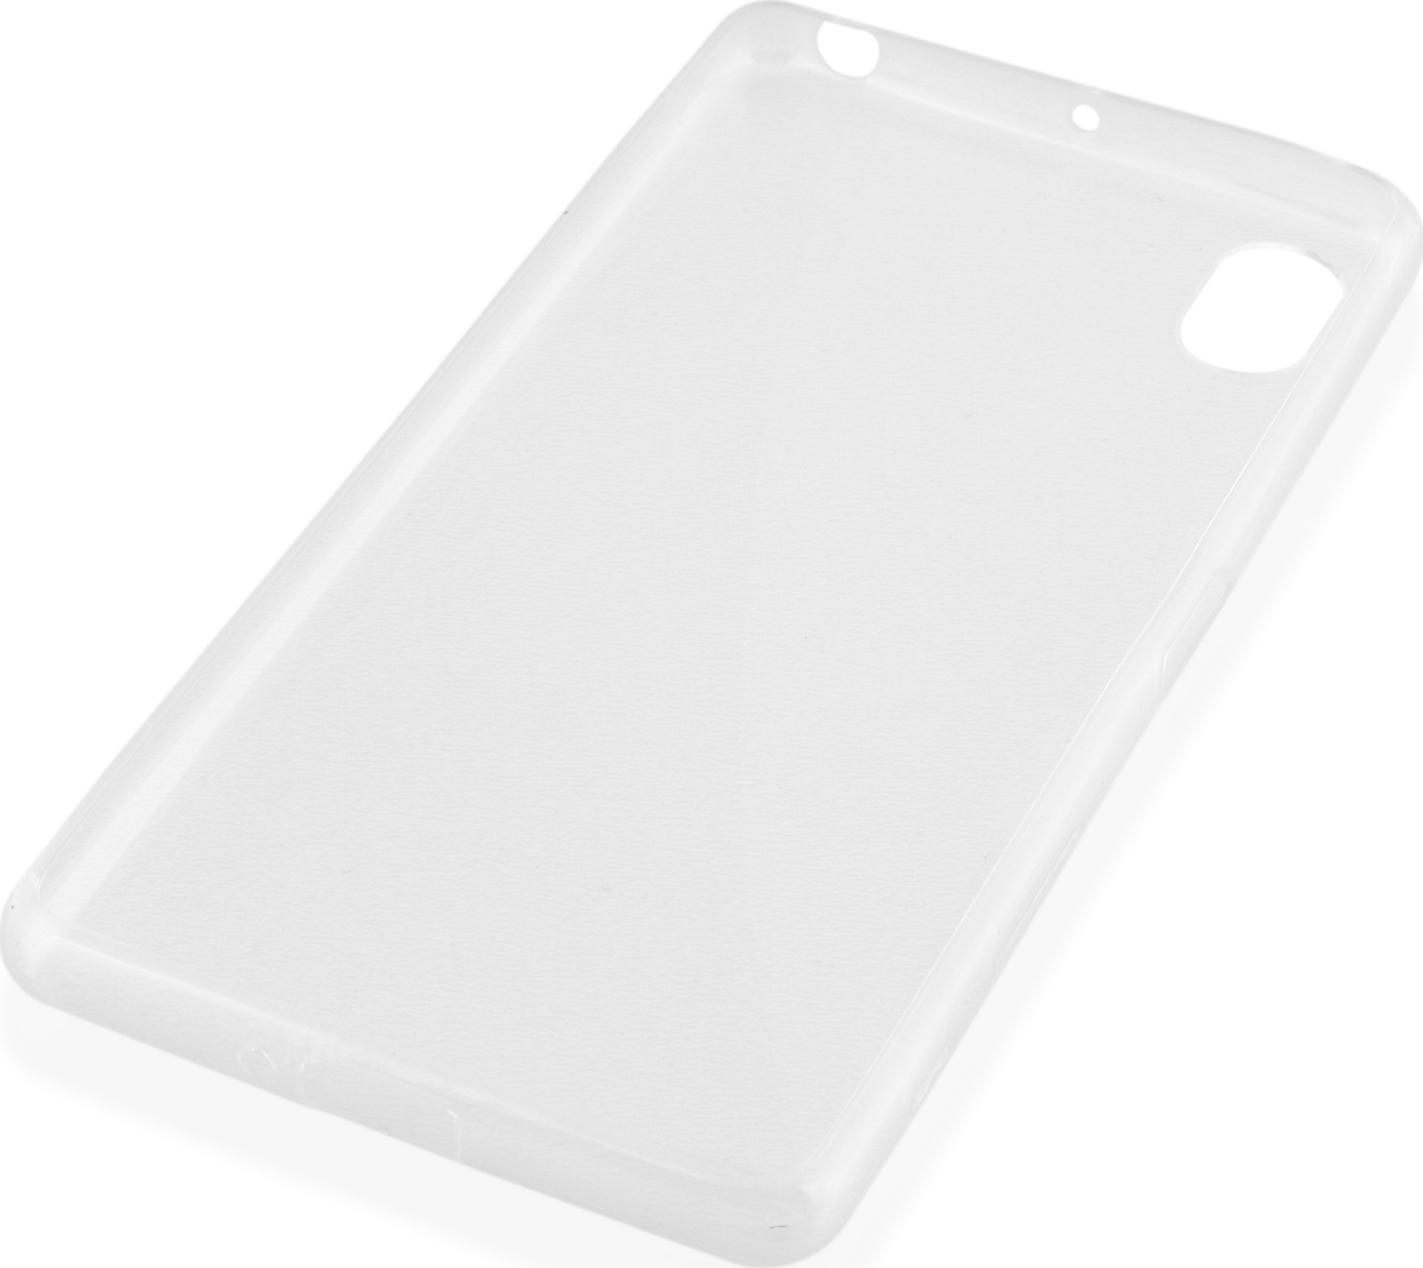 Чехол Brosco TPU для Sony Xperia X, прозрачный чехол для sony i4213 xperia 10 plus brosco силиконовая накладка черный